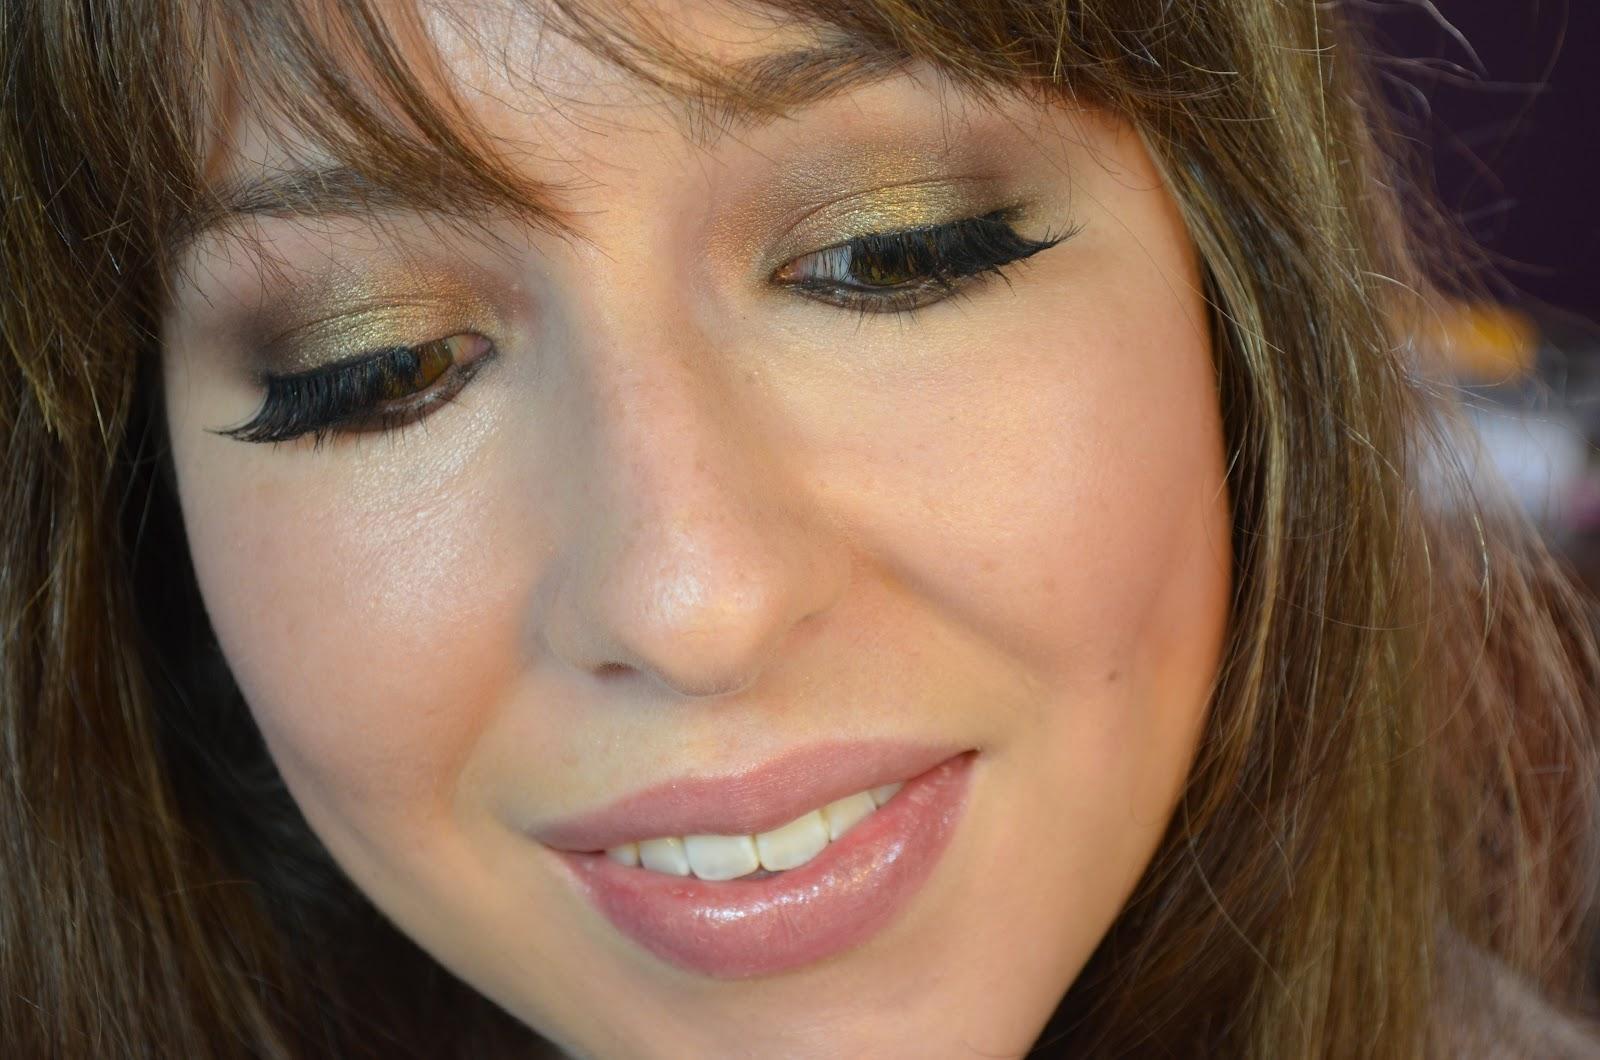 http://2.bp.blogspot.com/-5PEJNQMazFU/T71NQO65EdI/AAAAAAAAA60/Gde-JGSNmmQ/s1600/DSC_0266.JPG